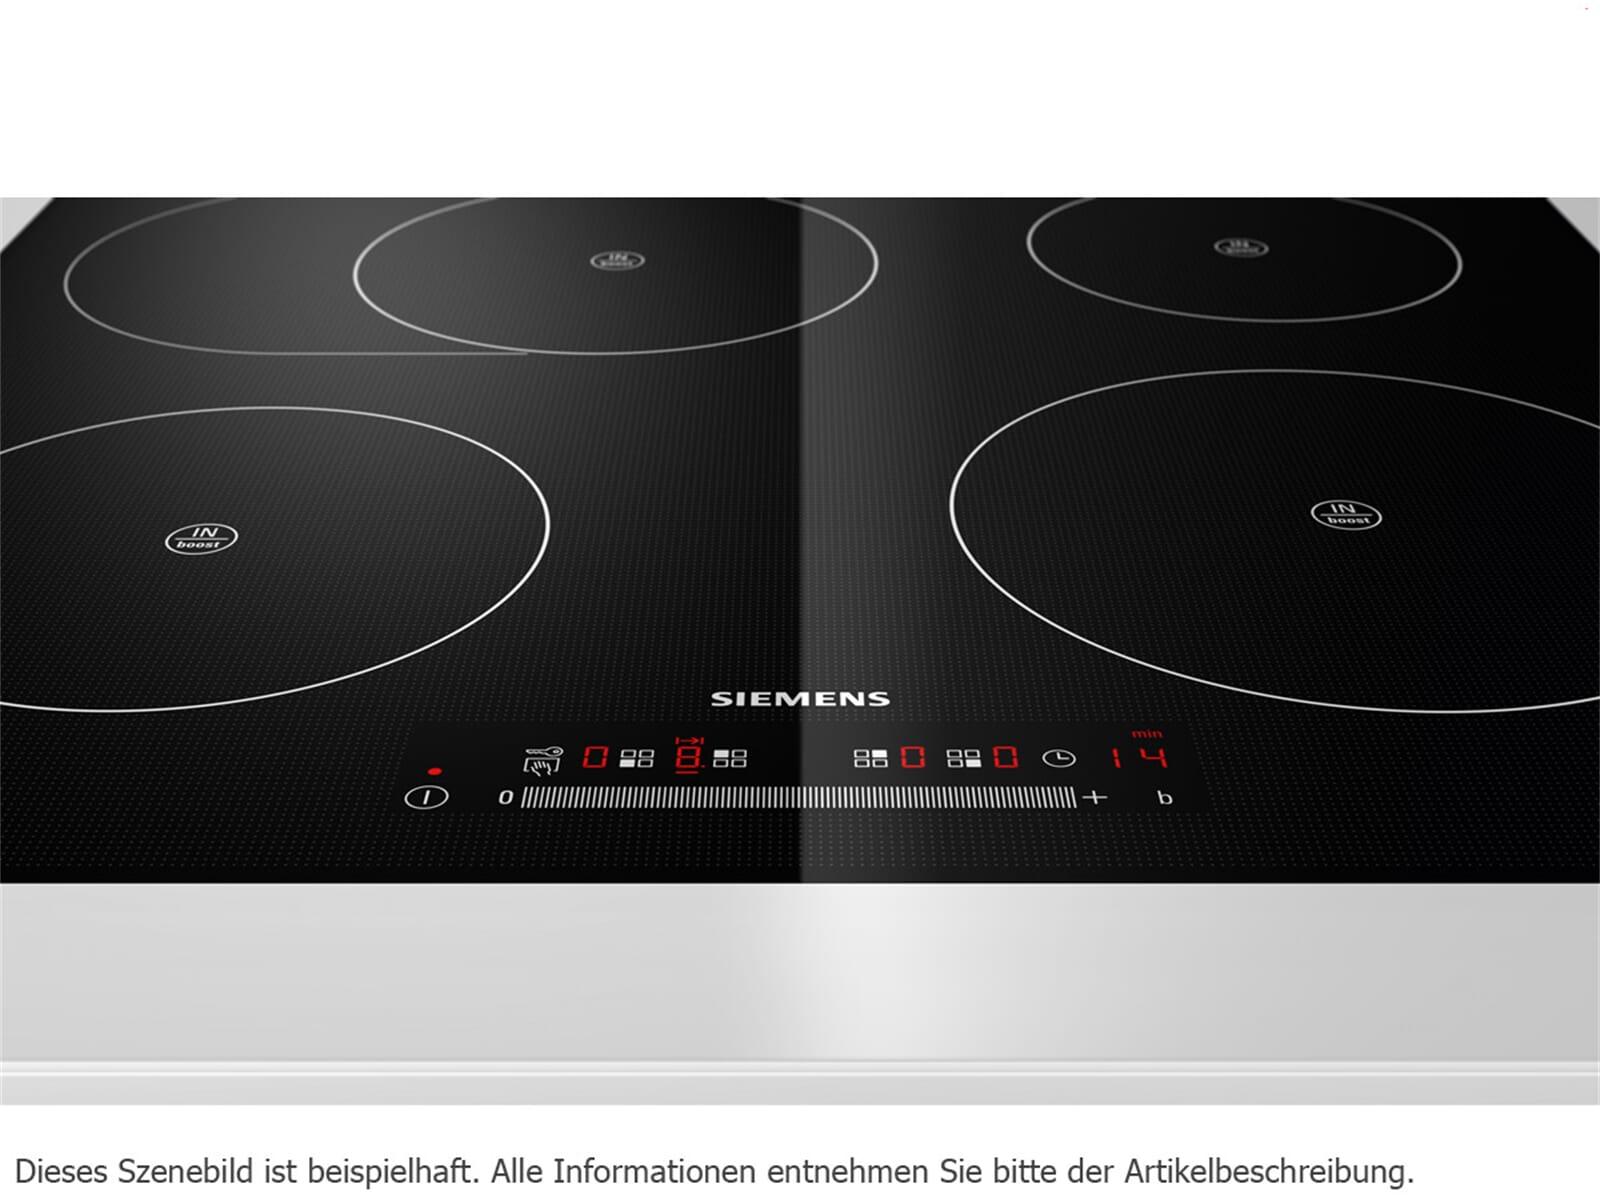 siemens eh601fb17 induktion glaskeramik kochfeld autark f r 844 90 eur. Black Bedroom Furniture Sets. Home Design Ideas